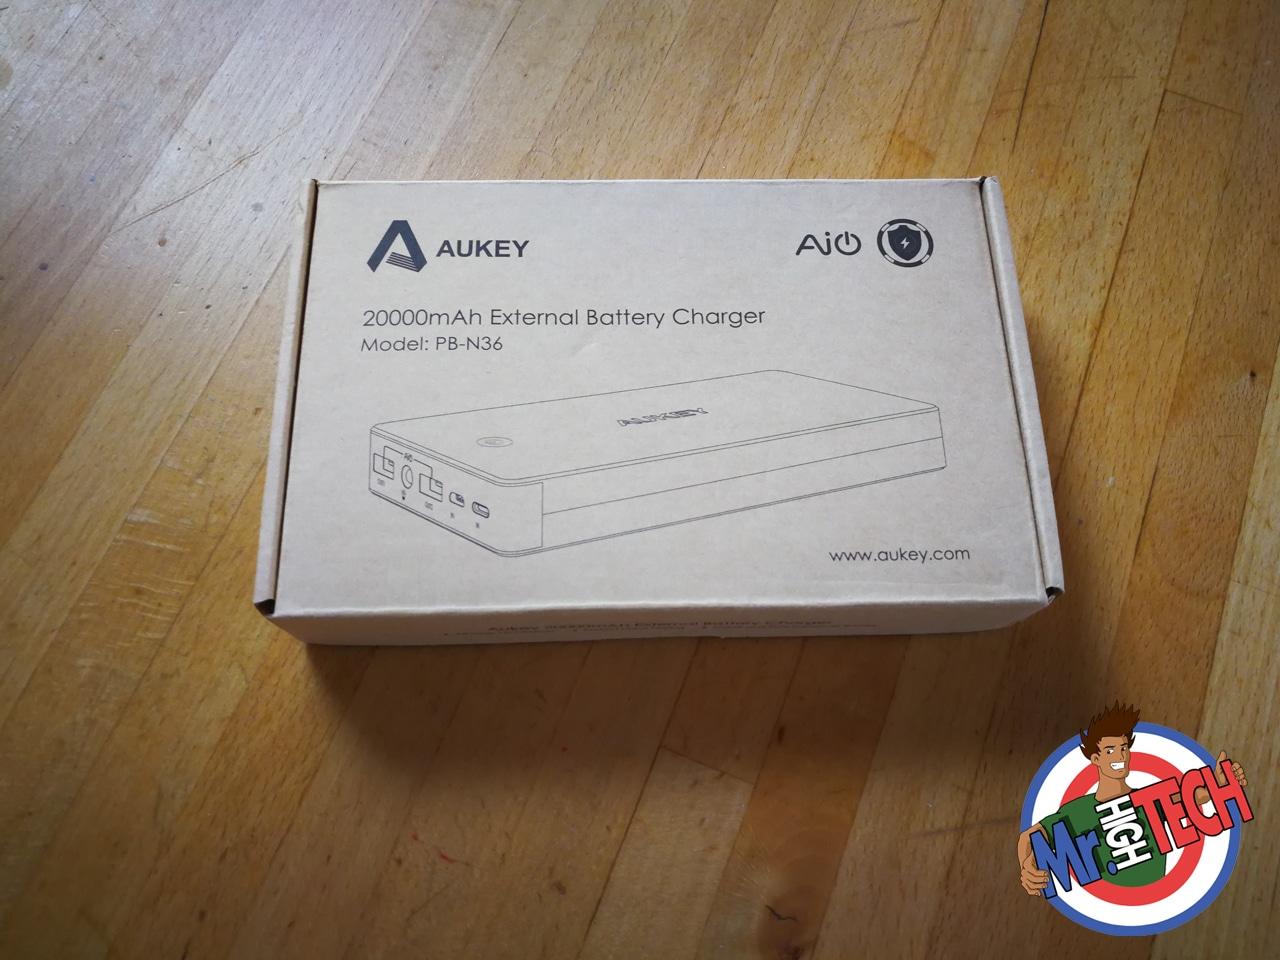 Aukey PB-N36 Batterie externe 20000mah